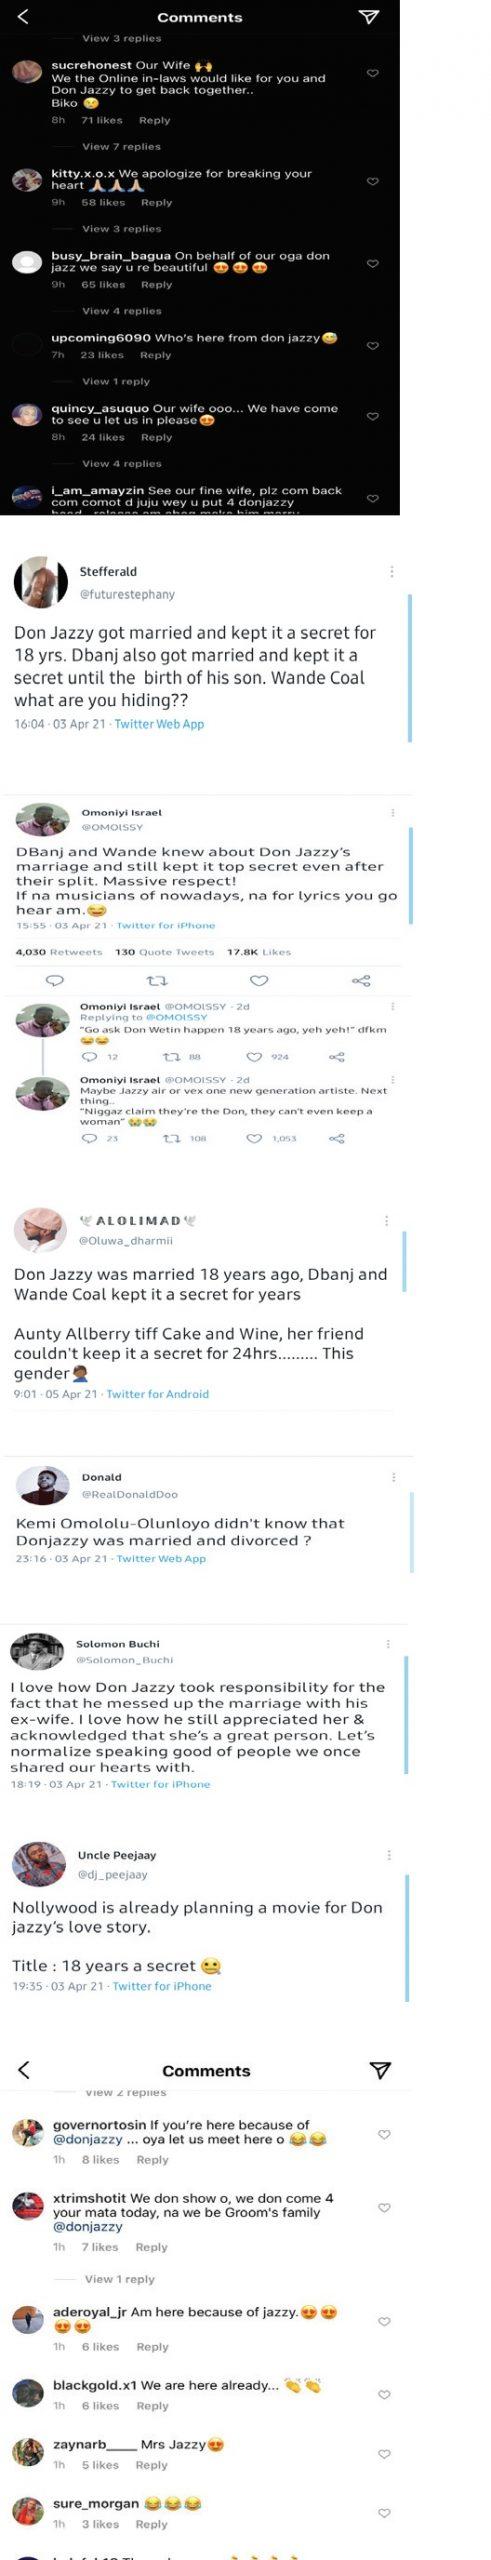 Donjazzy Failed marriage 22